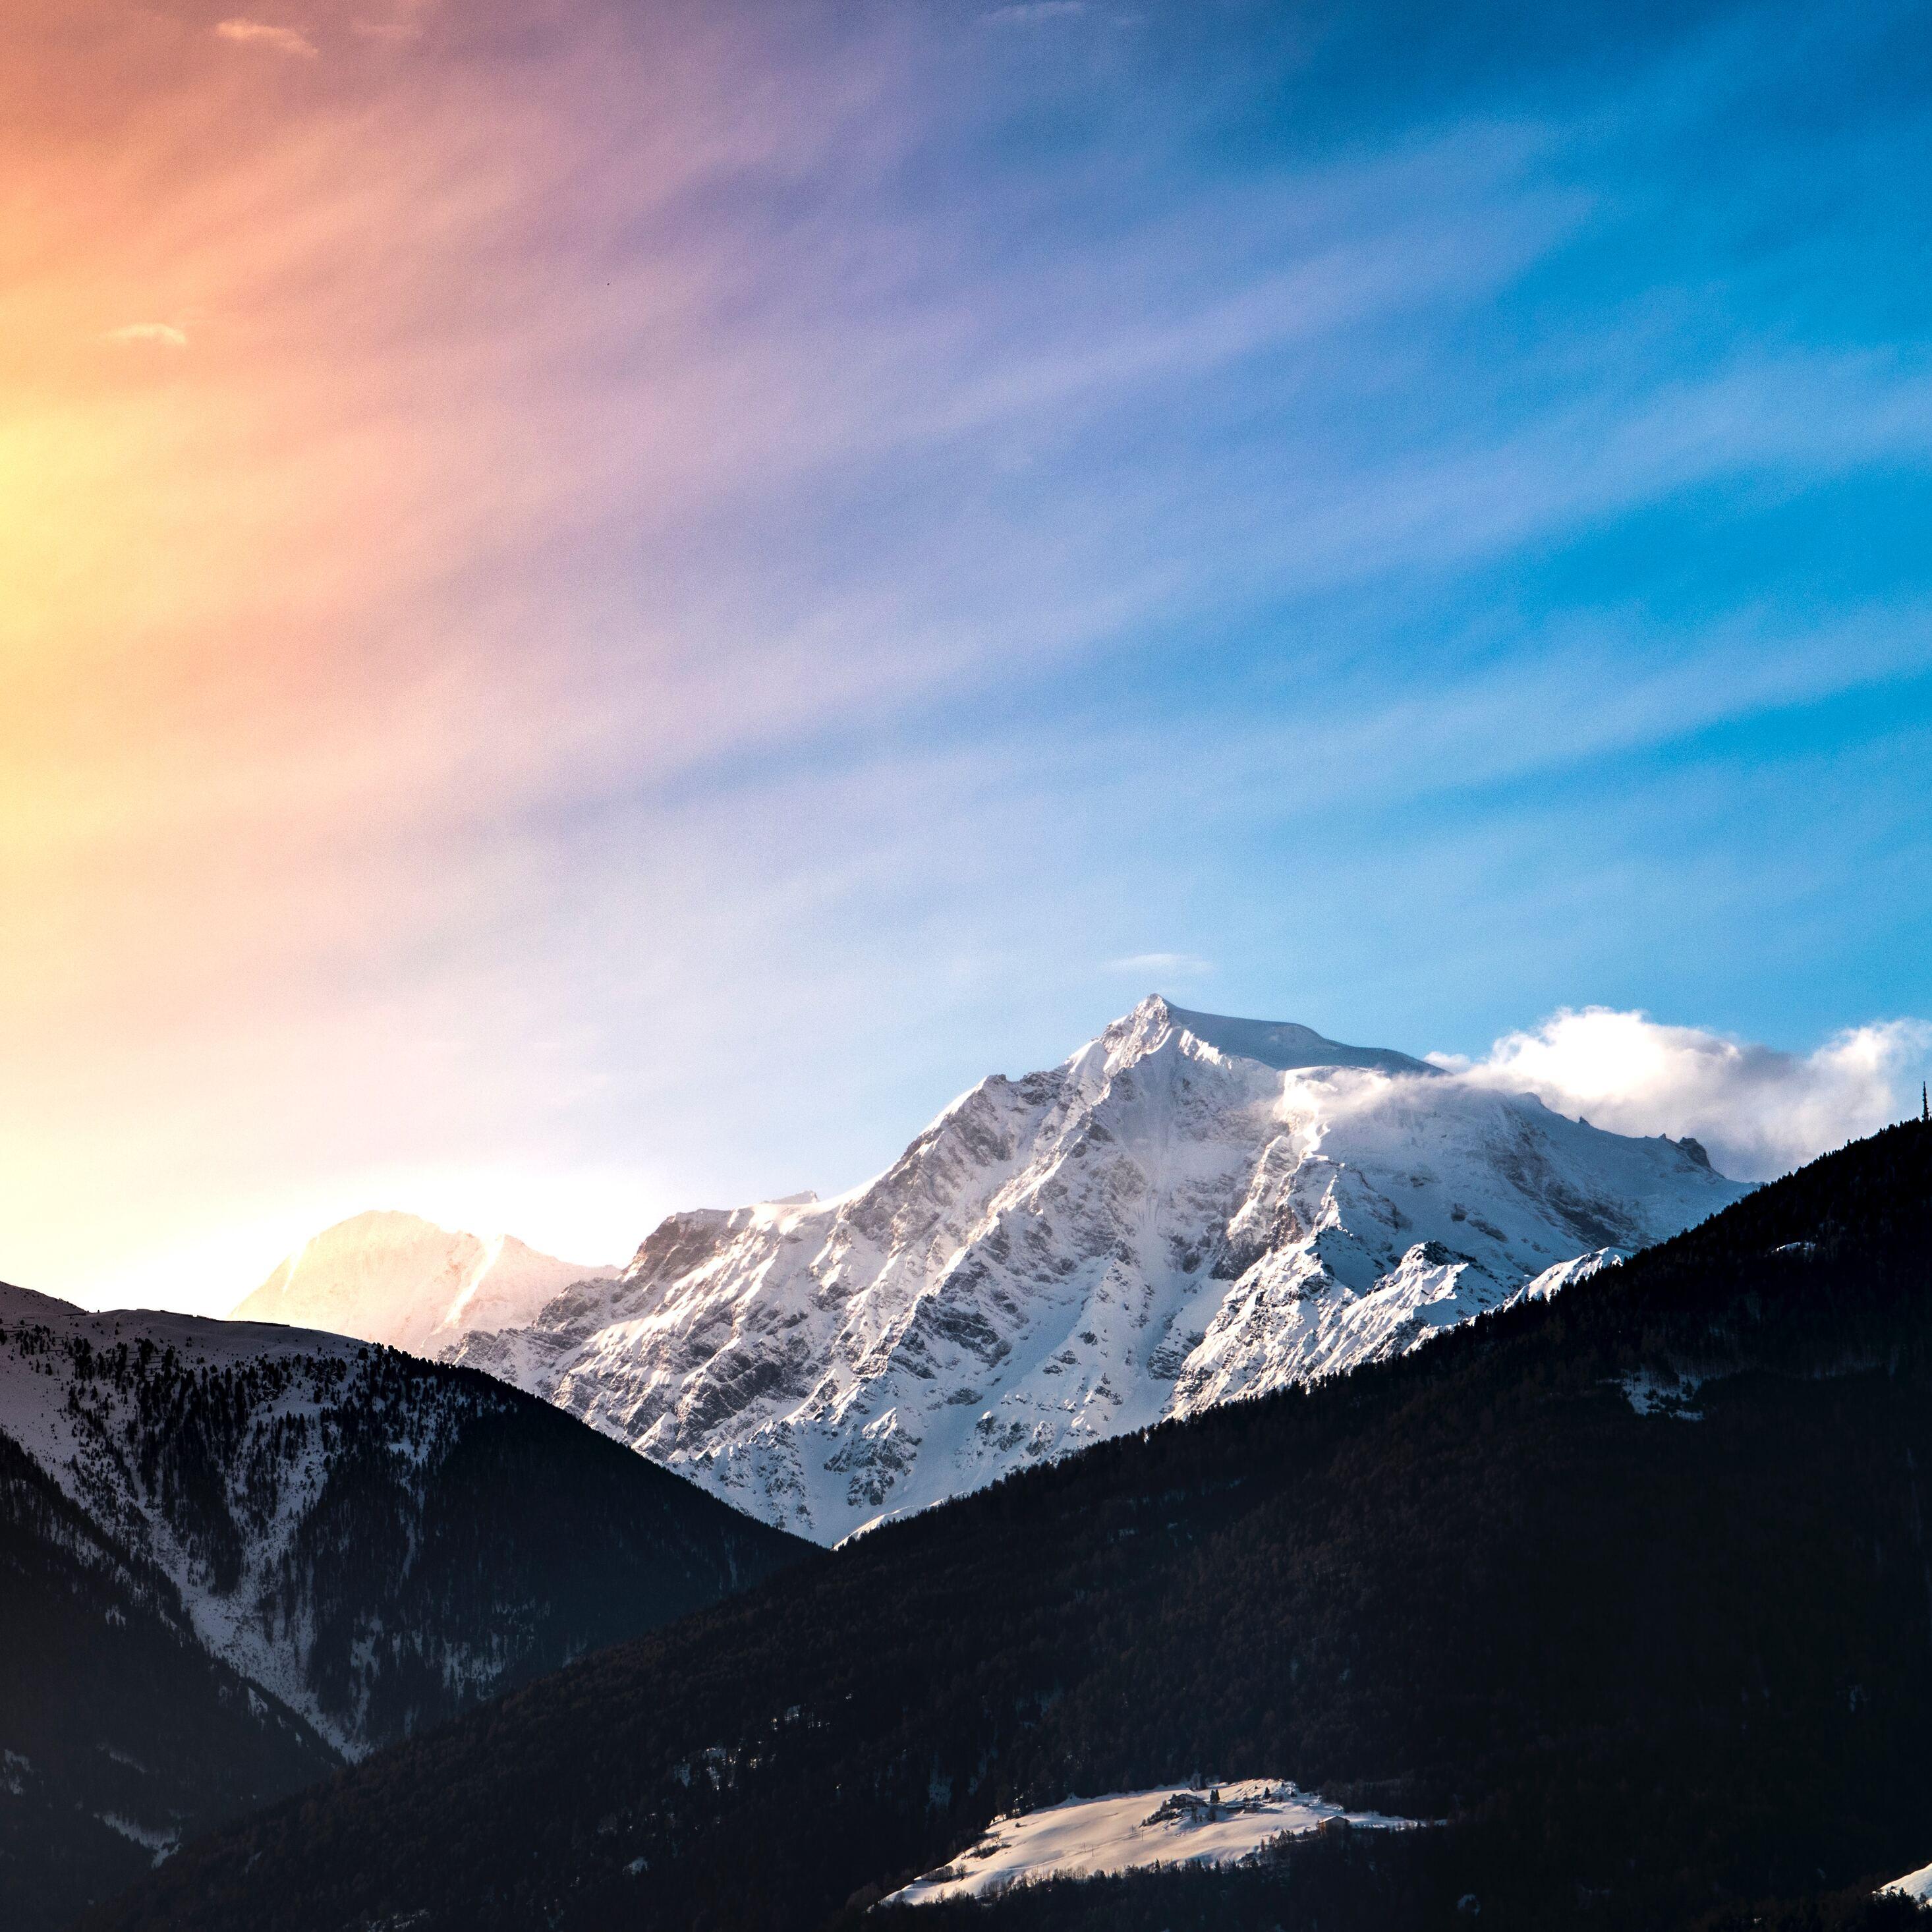 snow-covered-mountain-5k-1x.jpg